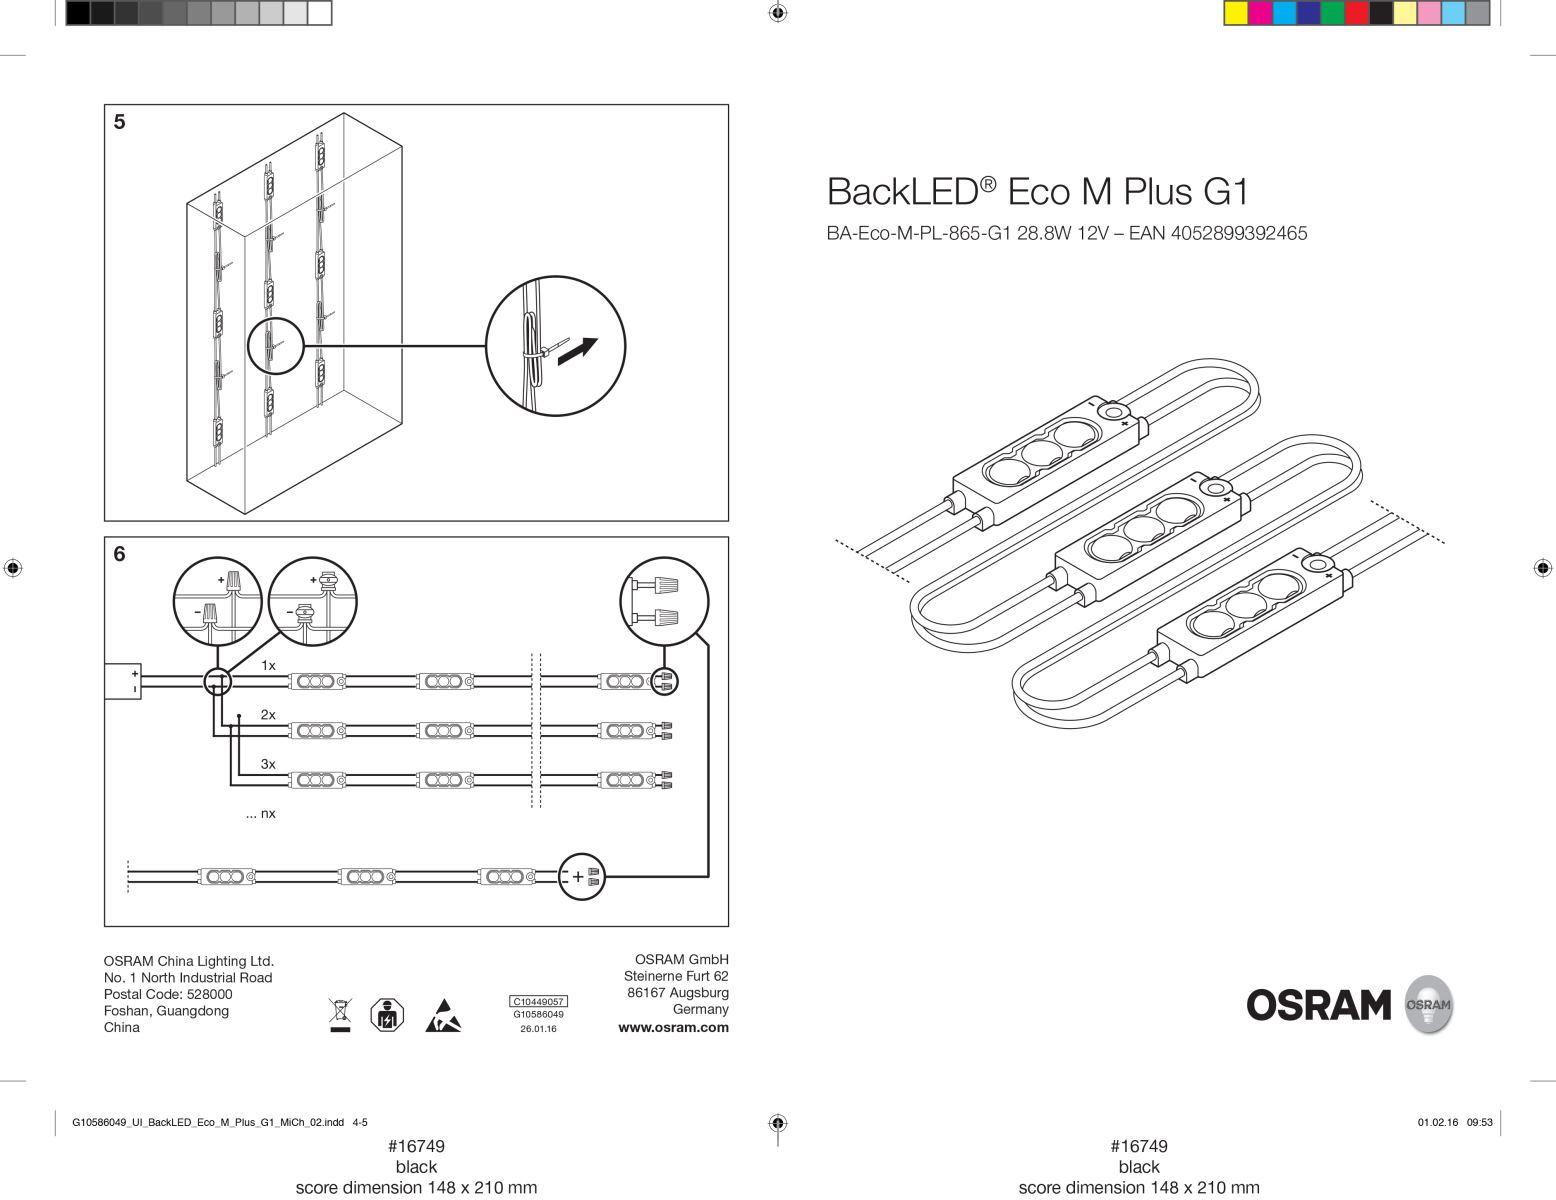 Hướng dẩn lắp đặt BackLED® Eco M Plus G1